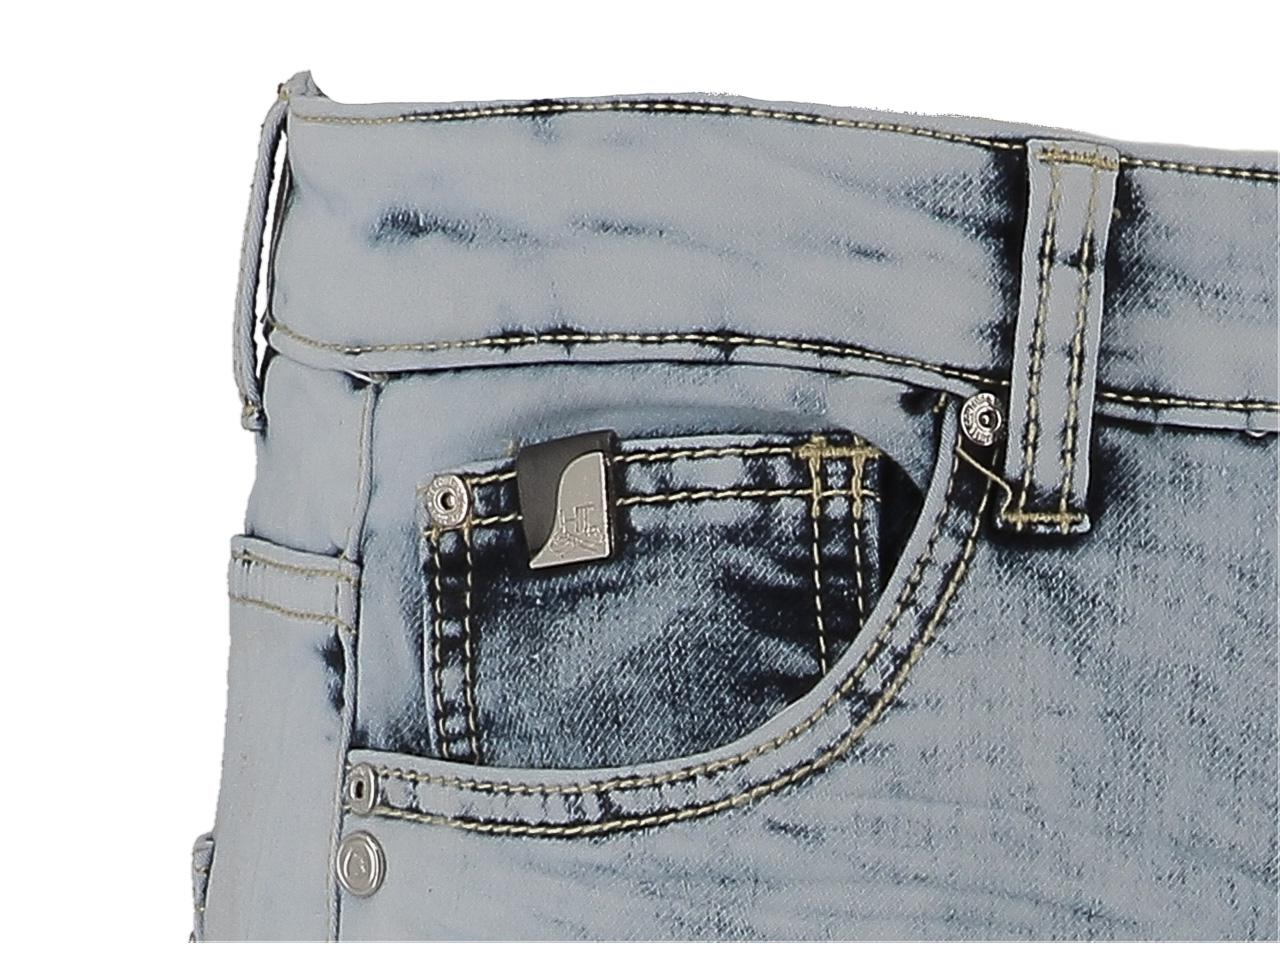 Bermuda-Shorts-Hite-Couture-Spill-Denim-Blue-Bermuda-Blue-11588-New thumbnail 3